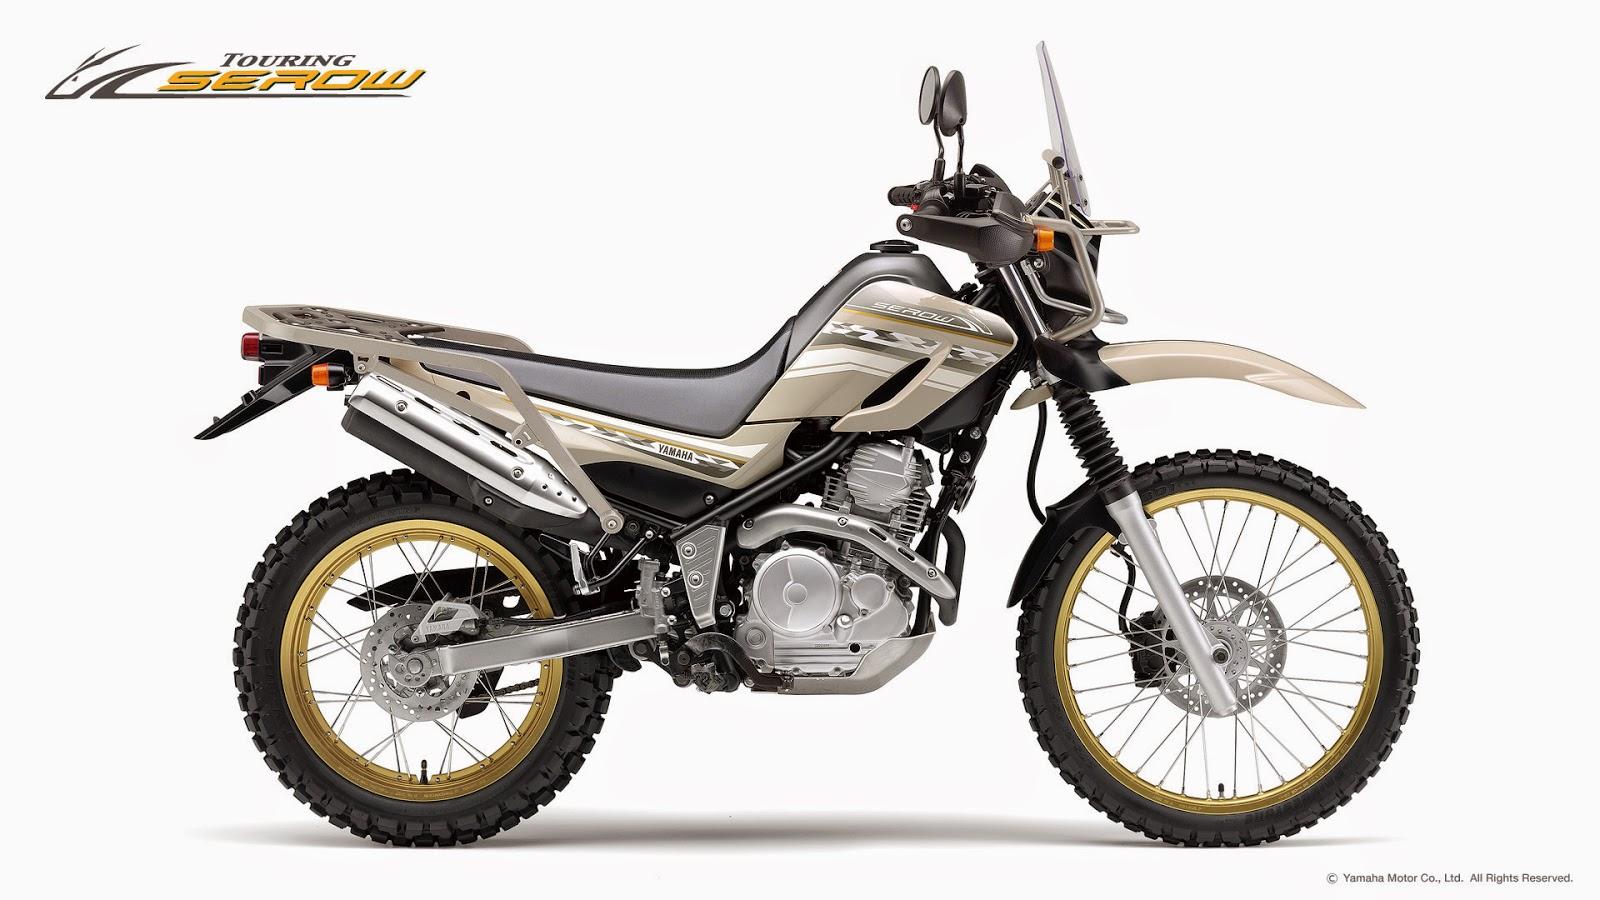 Planet Japan Blog: Yamaha Touring Serow 250 2015